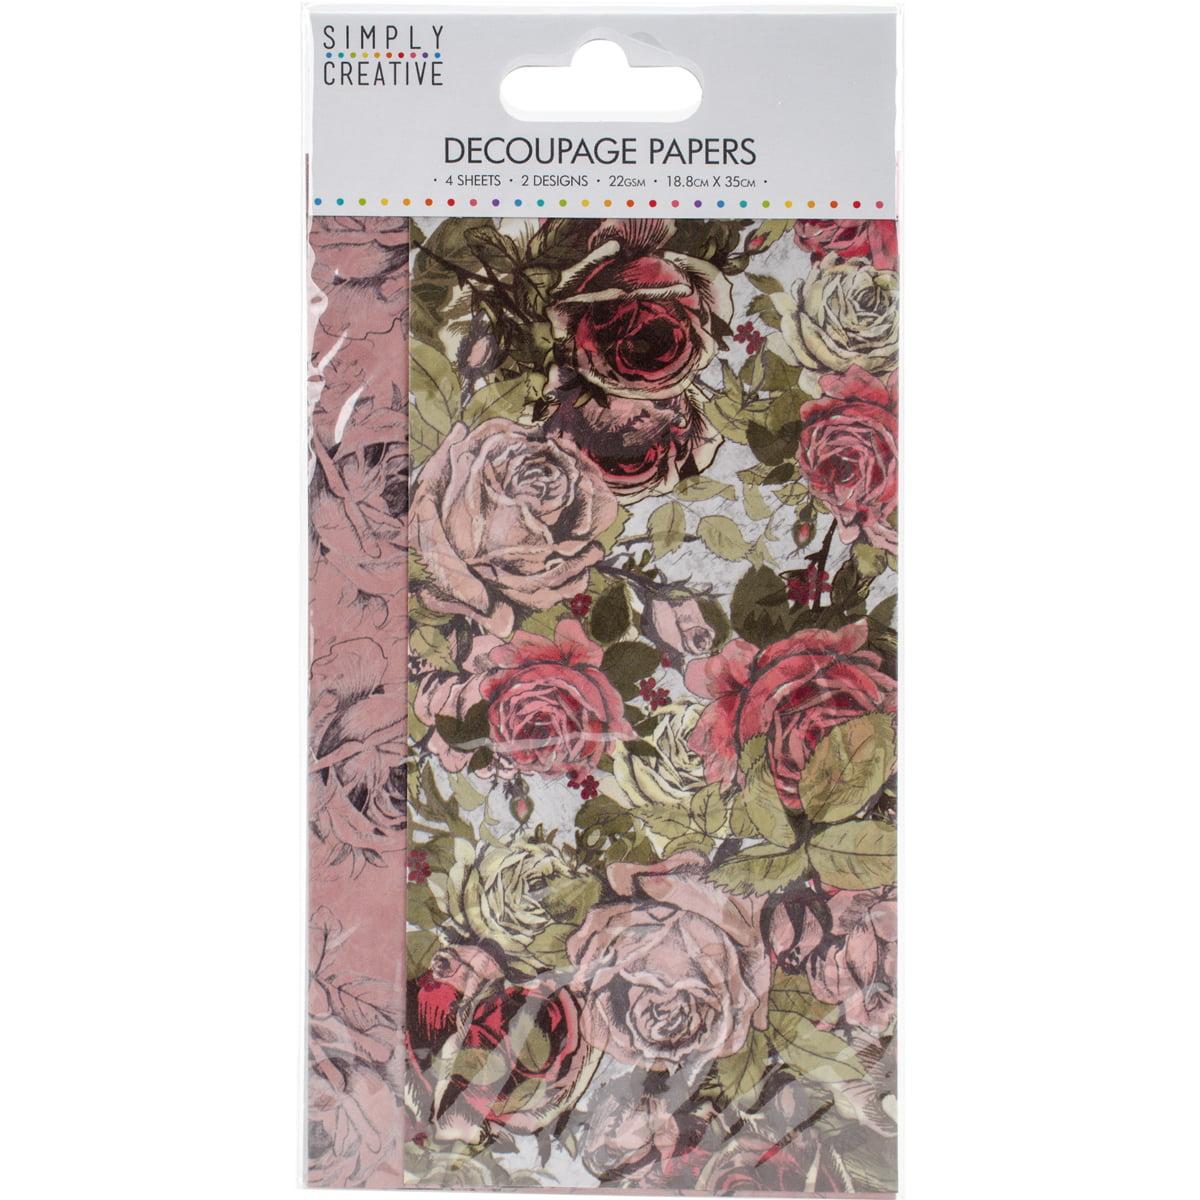 Simply Creative Decoupage Paper 18.8cm X 35cm 4/Pkg-Rose Bloom